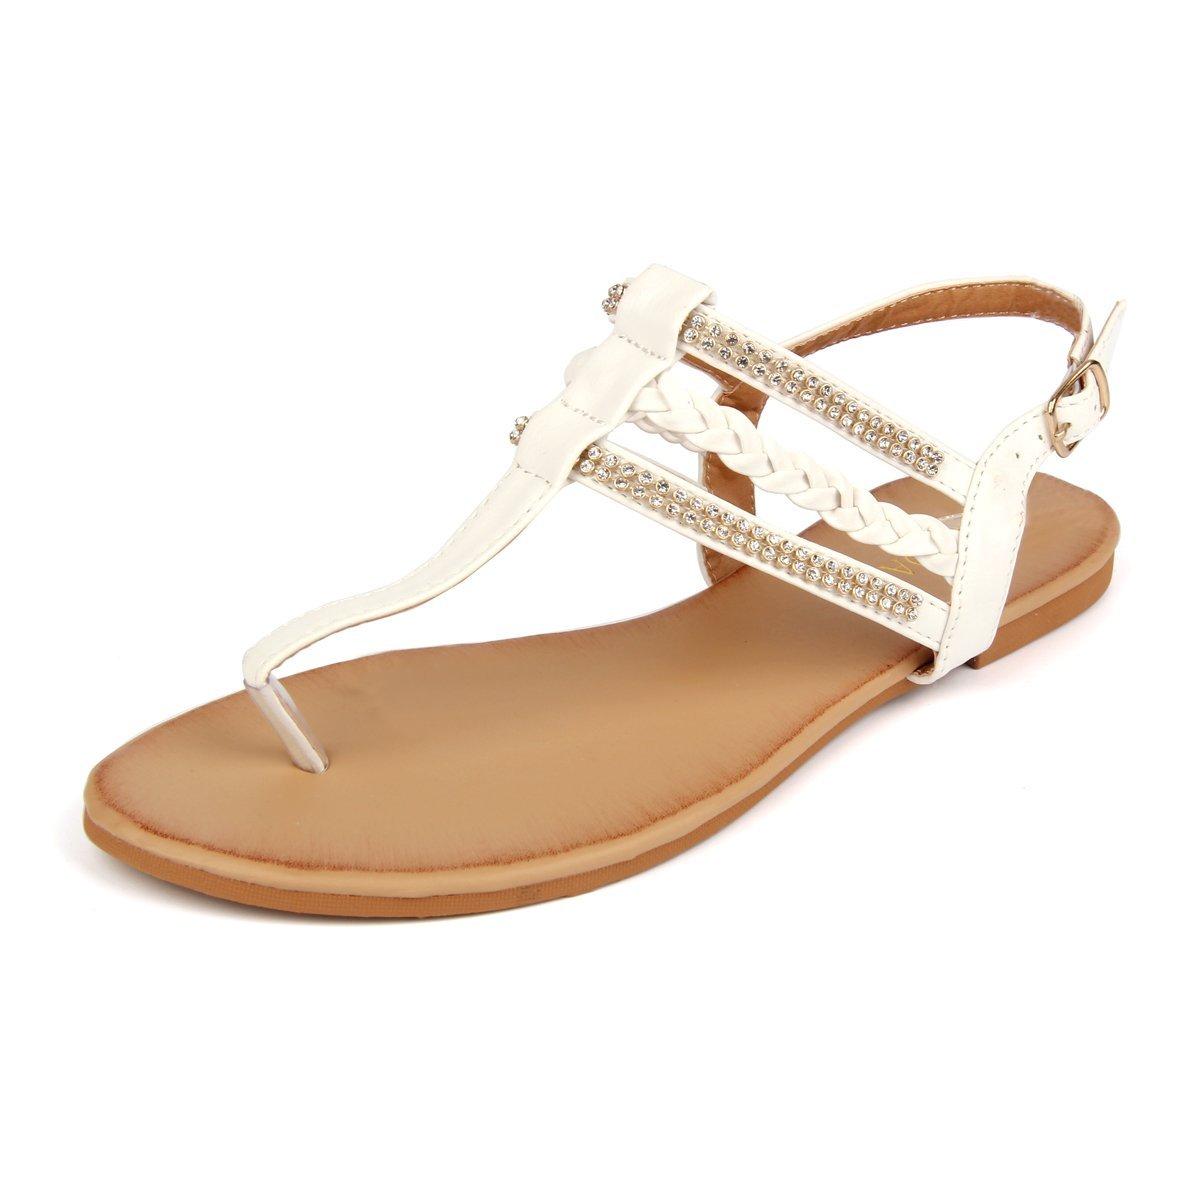 MuDan Women's Strappy Rhinestones Thong Buckle Strap Gladiator Flat Sandals (9 B(M) US, White)